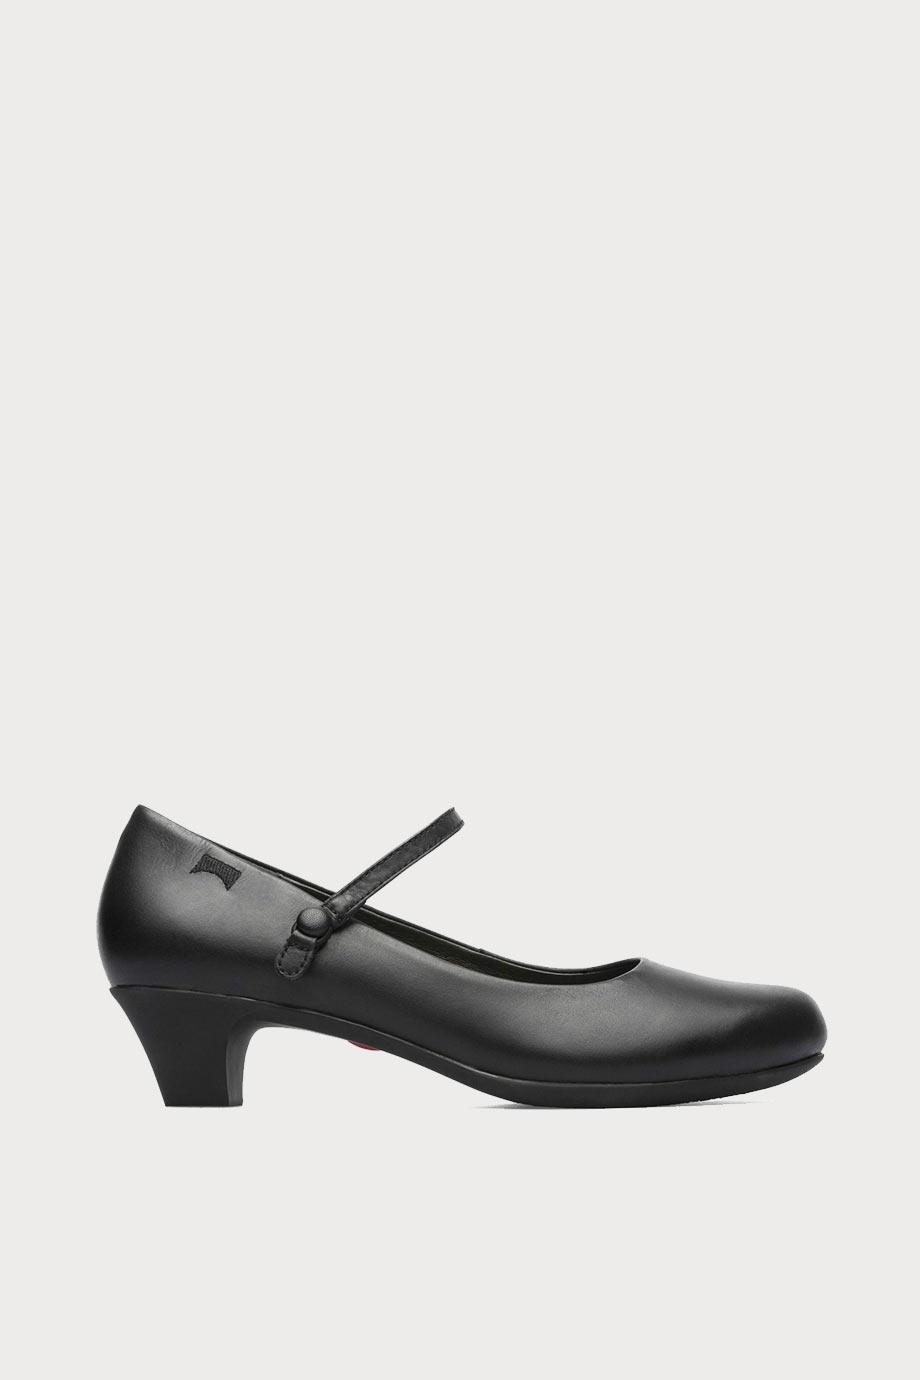 spiridoula metheniti shoes xalkida p camper 20202 088 helena bajo